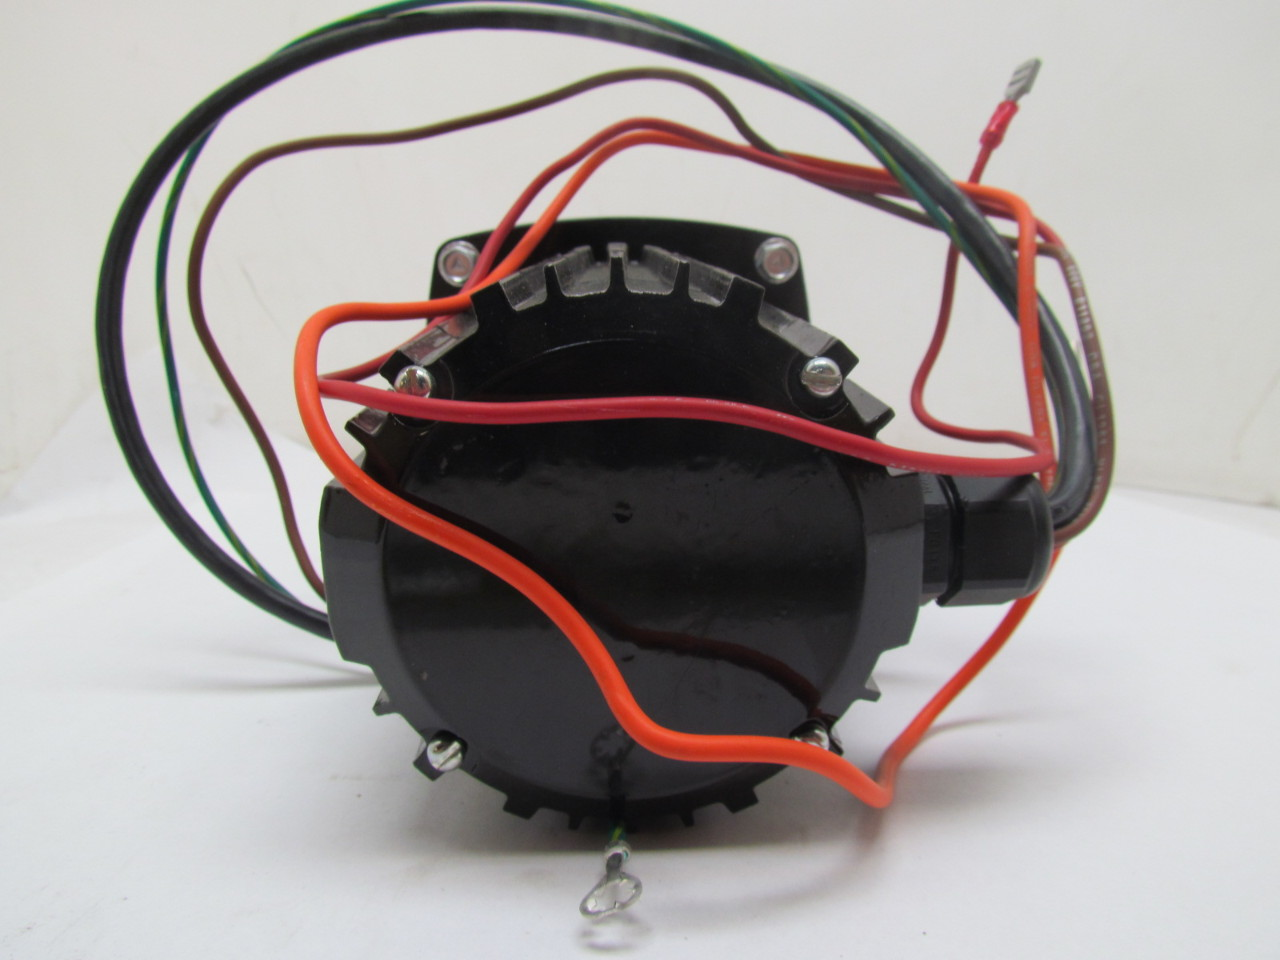 58762 bodine electric 34b6bebl f3 24v gearmotor 18amp 3 8hp 125rpm 201 ratio 9?resize\\\\\\\\\\\\\\\=665%2C499 bodine motor wiring diagram wiring diagram shrutiradio DC Motor Wiring Schematic at soozxer.org